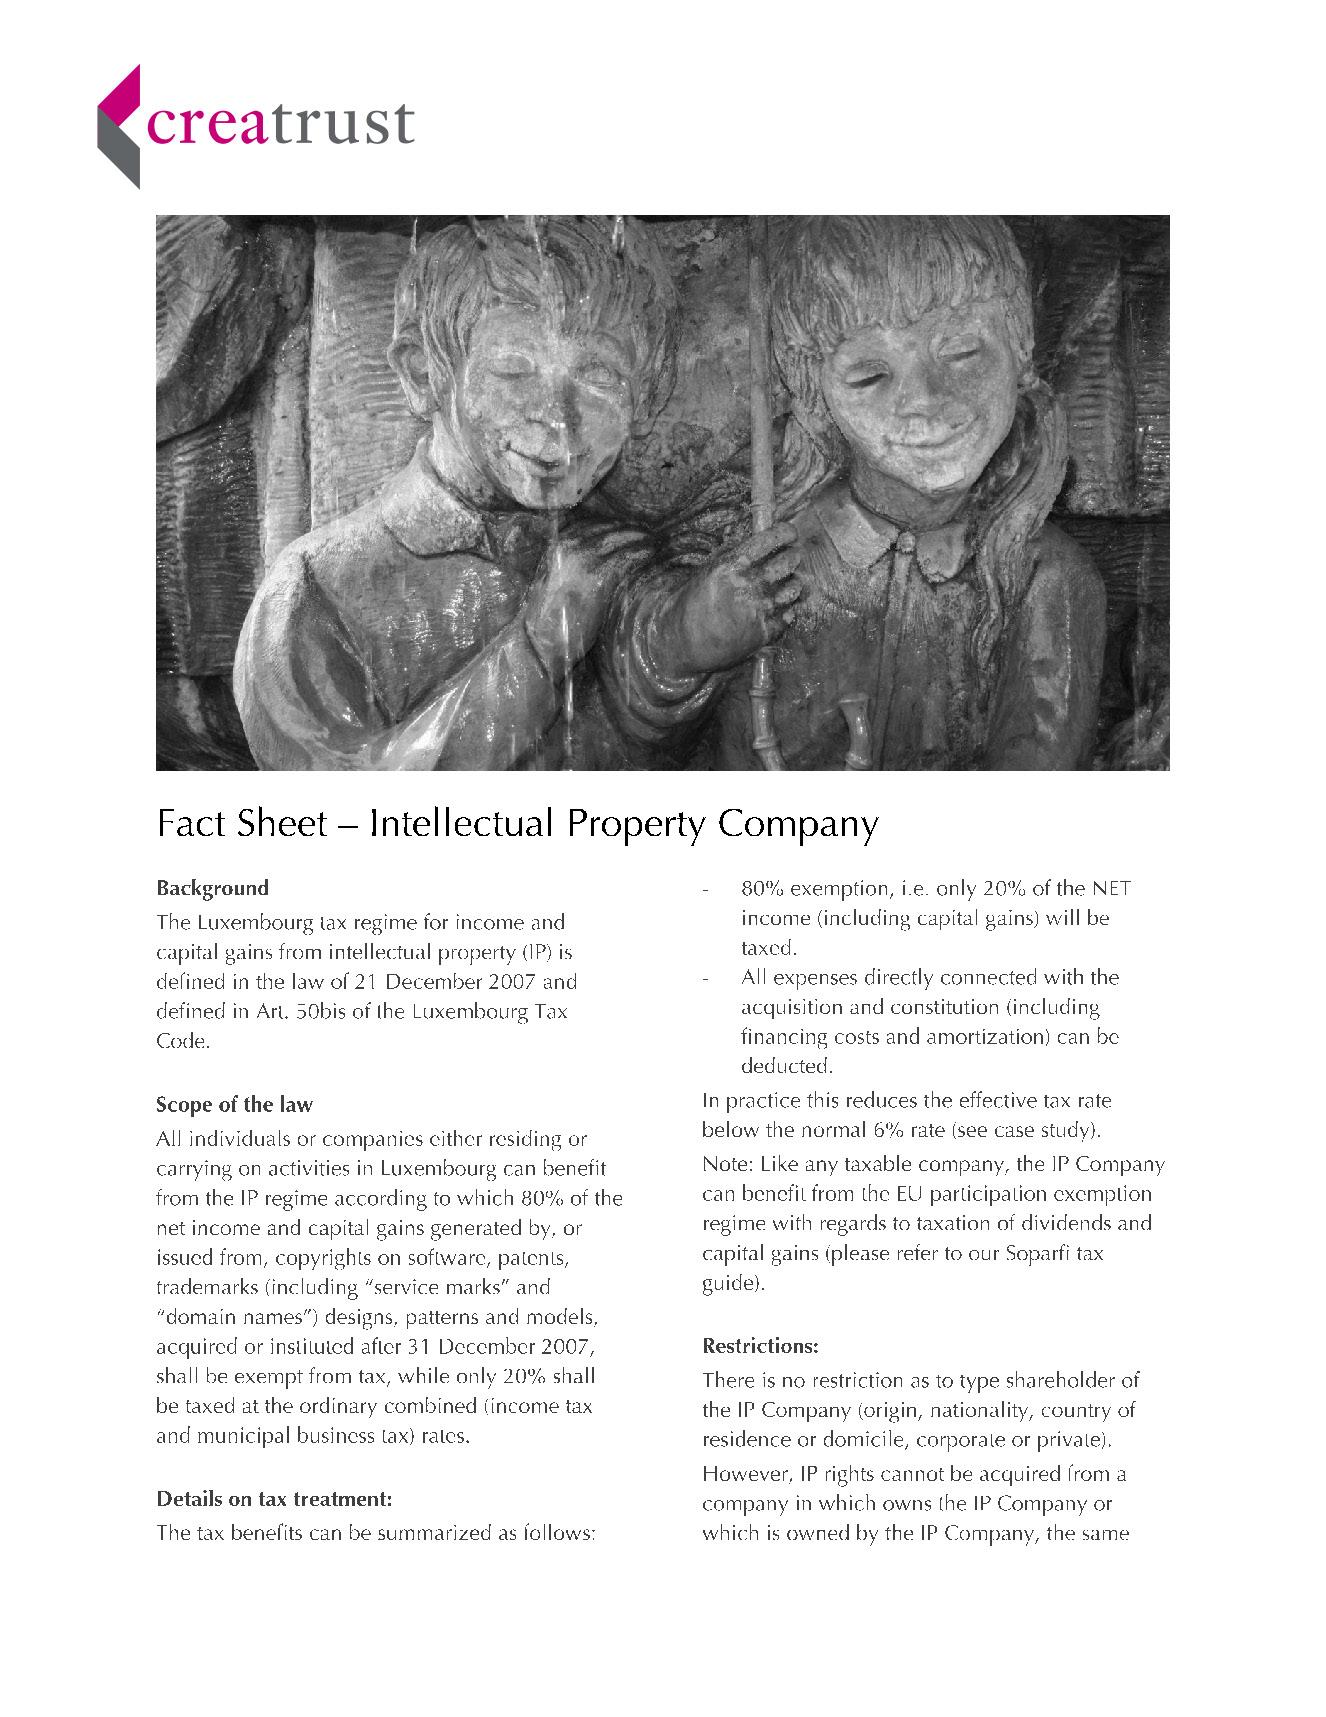 Brochures and Factsheets